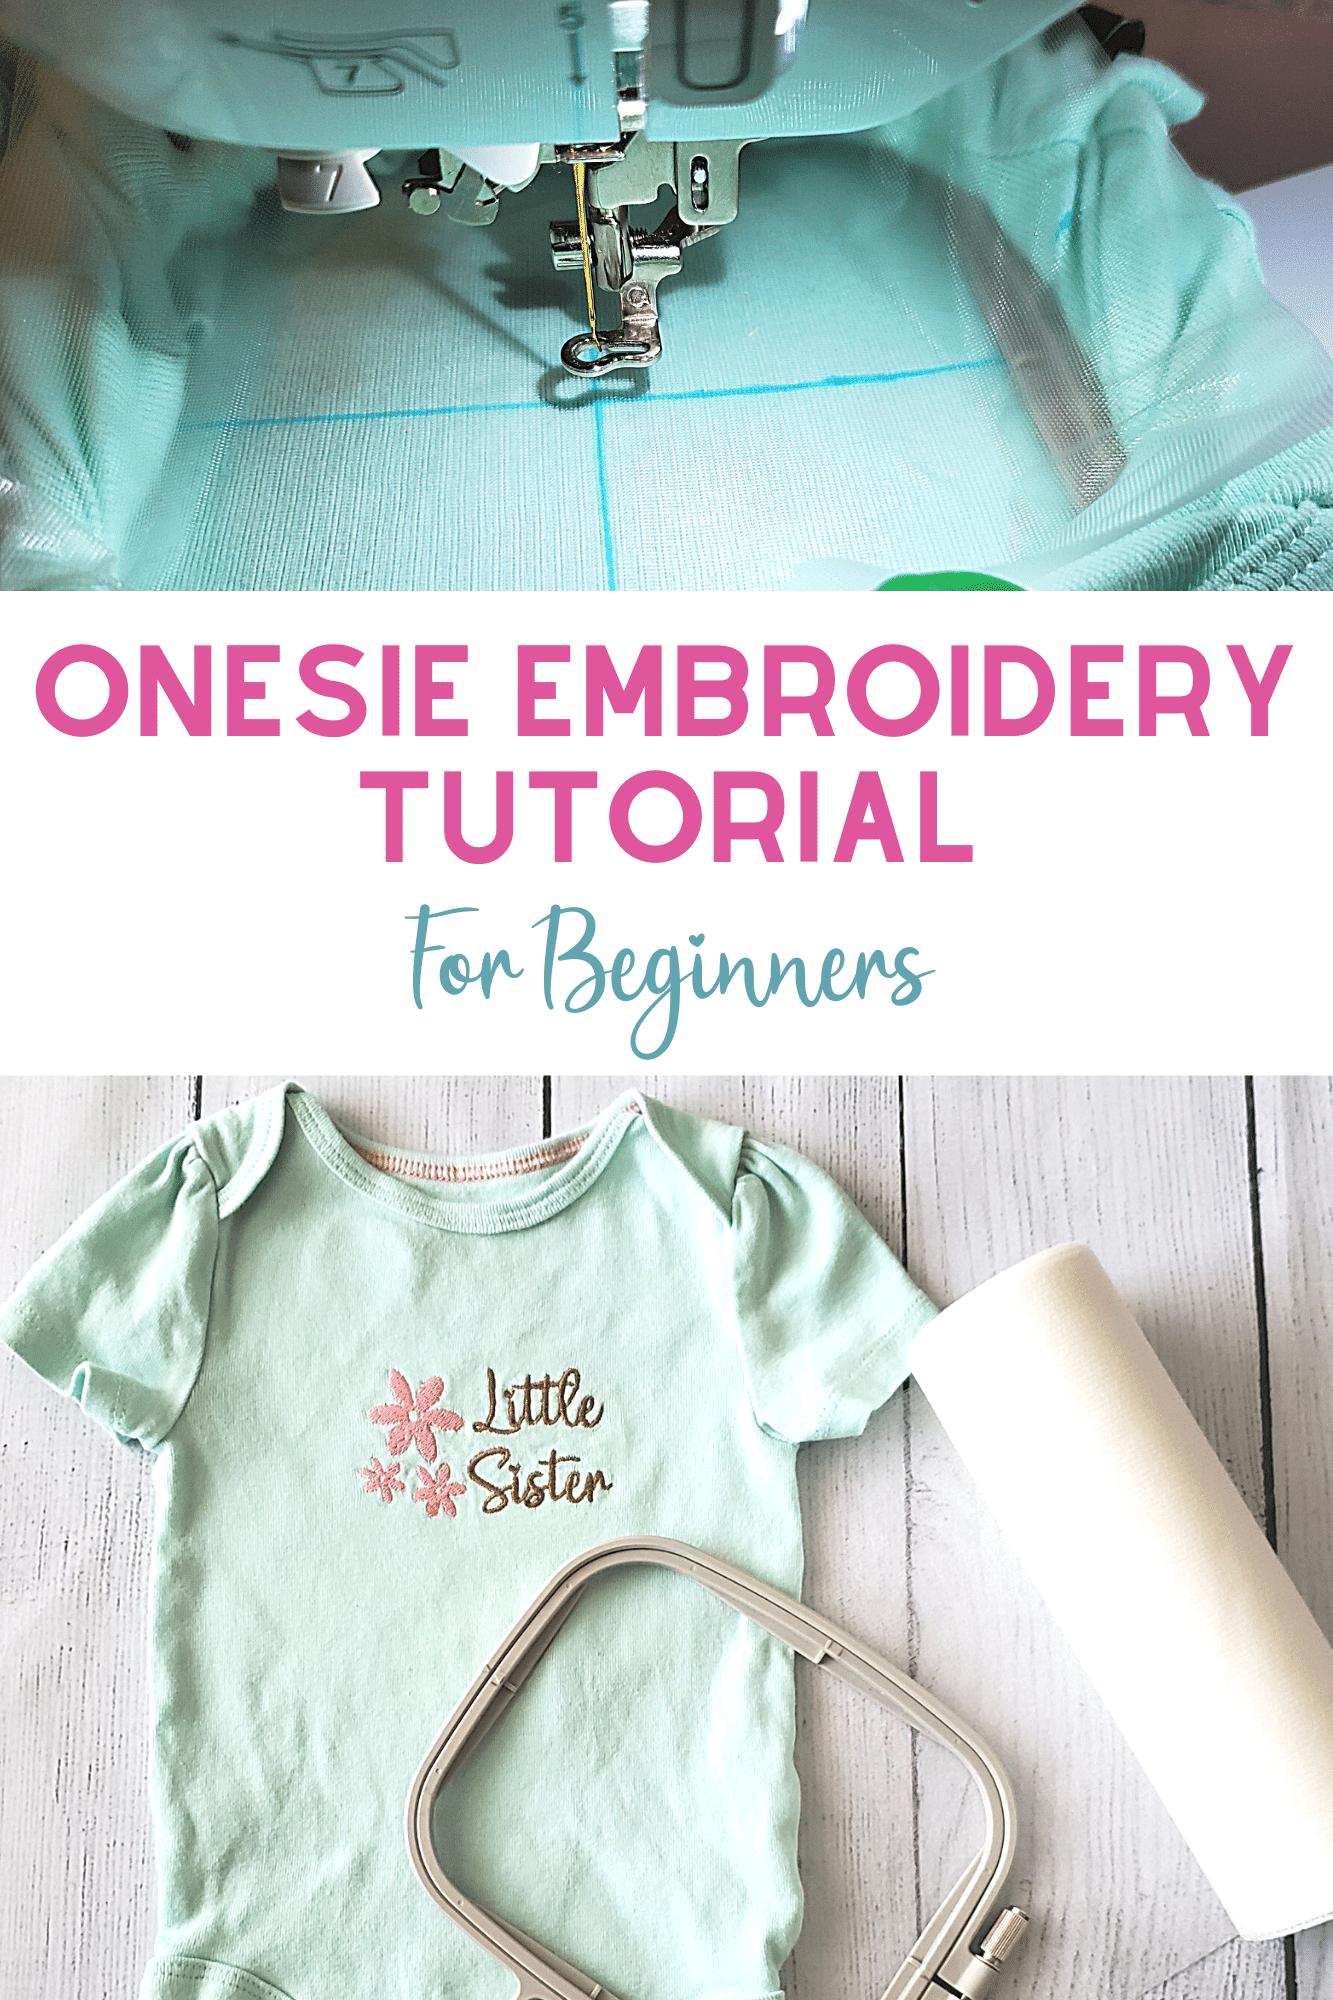 onesie embroidery tutorial for beginner